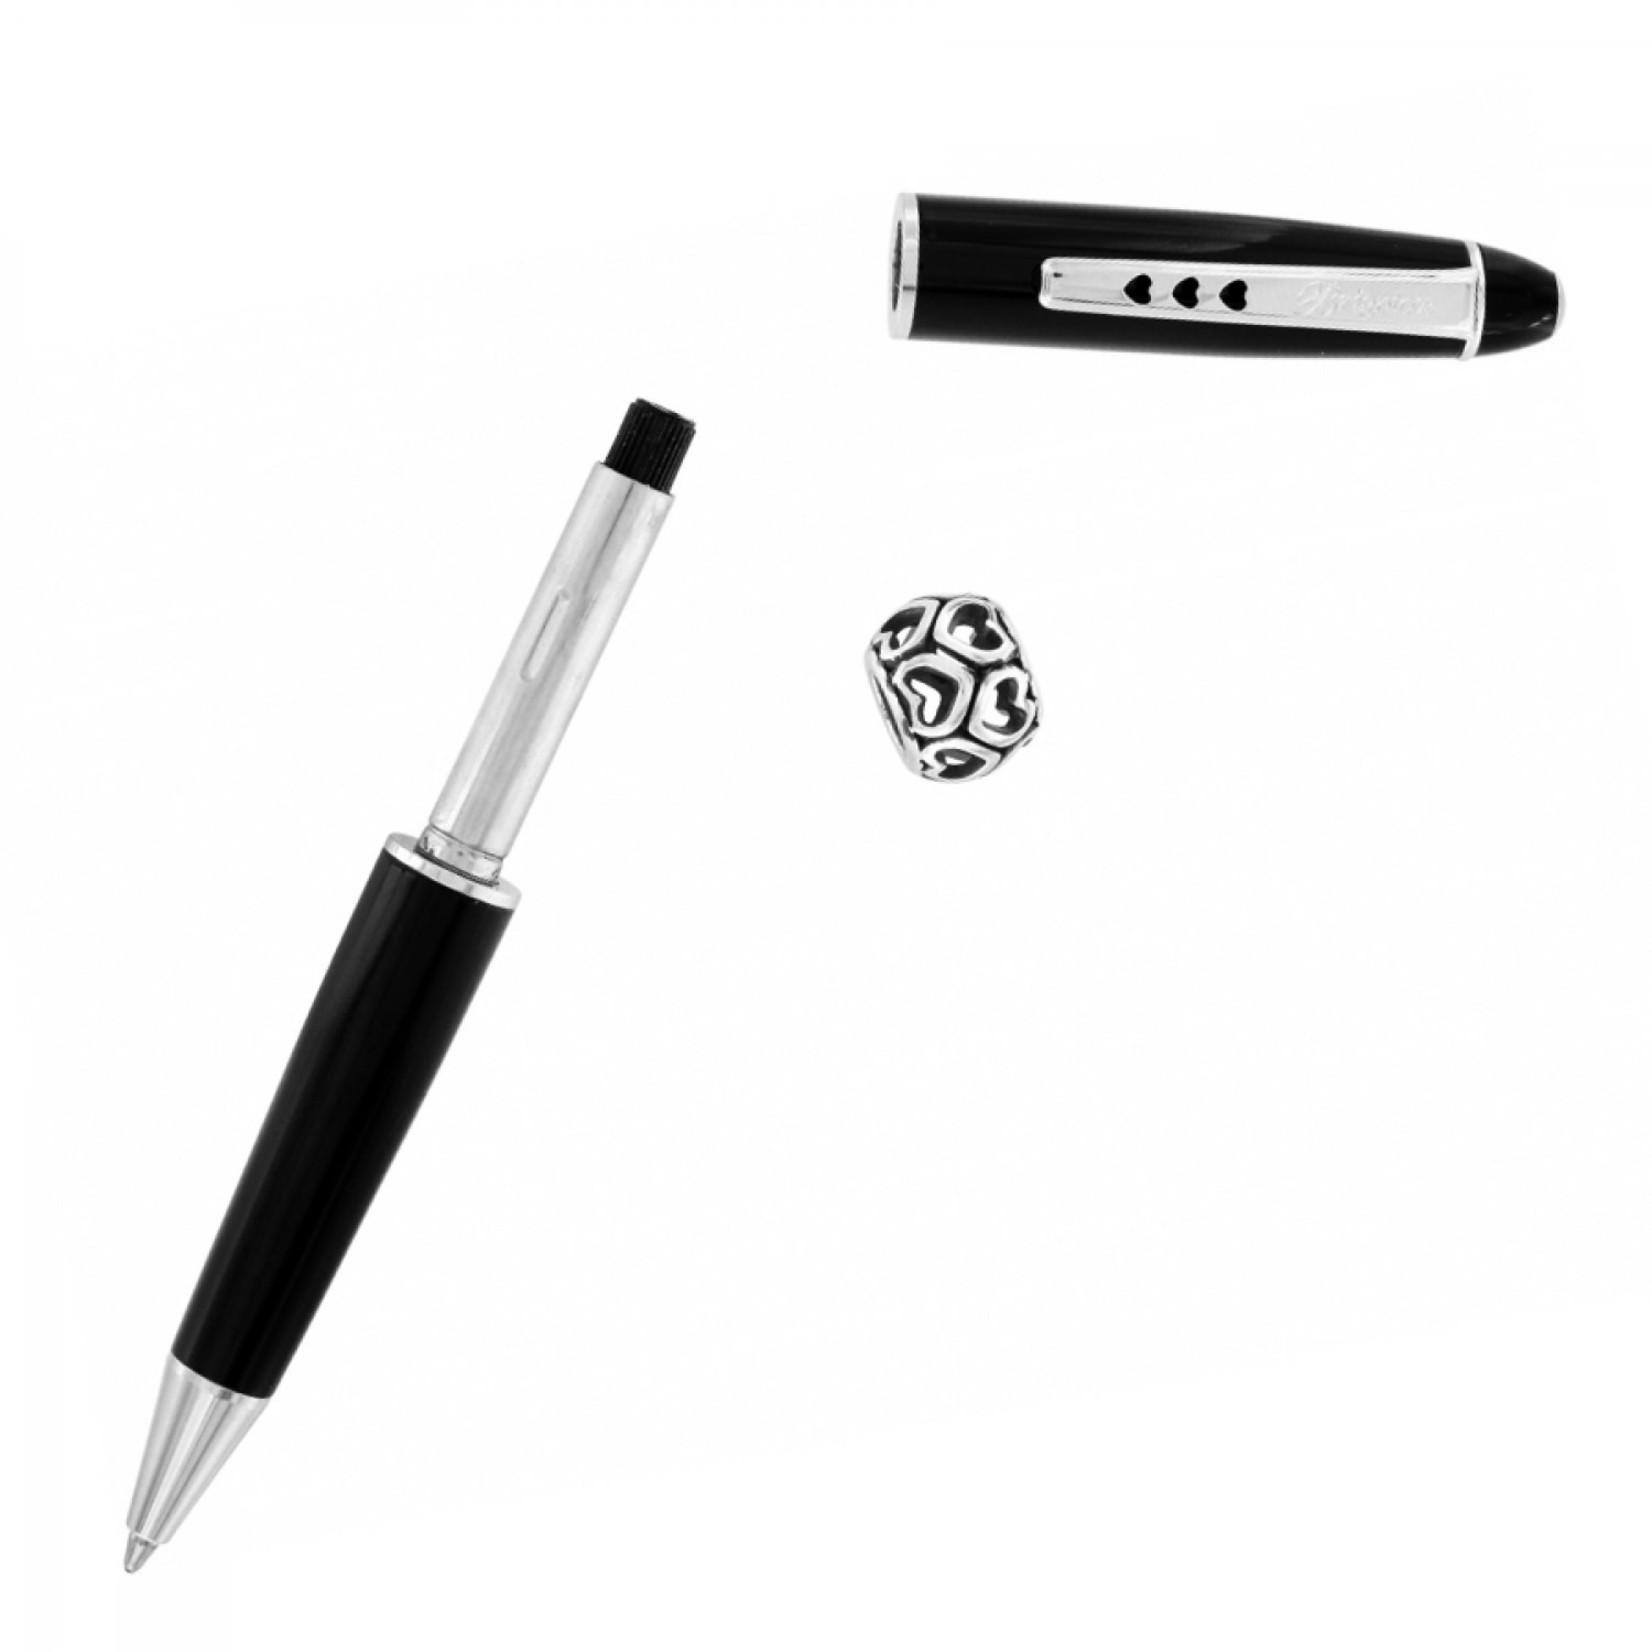 Brighton J97213 Pen Pal Short Charm Pen - Black/Silver